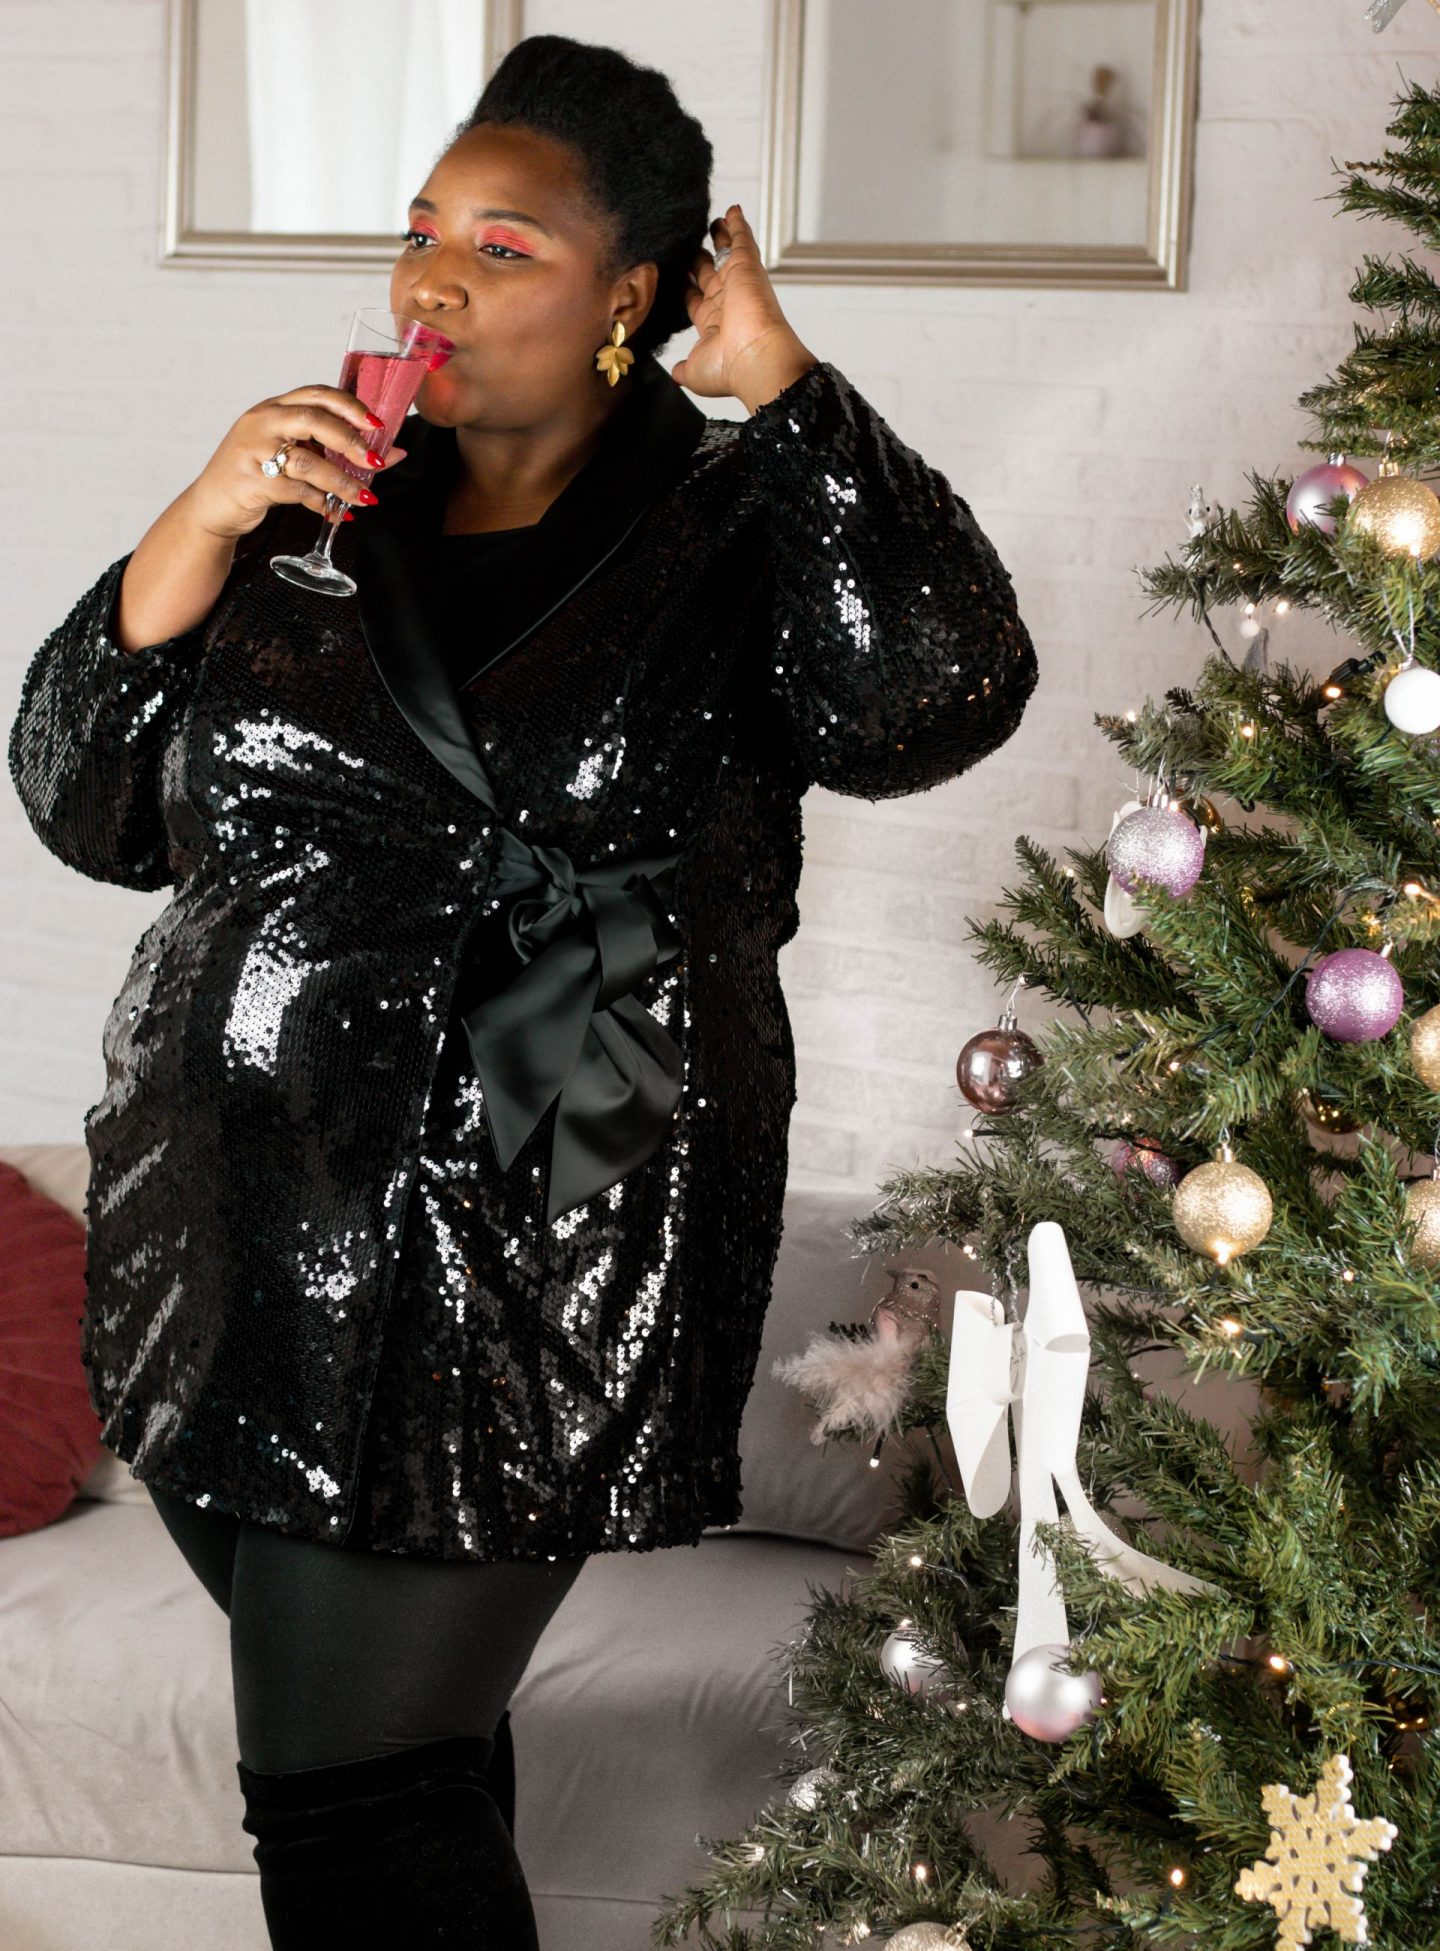 Glitters en pailletten voor de feestdagen